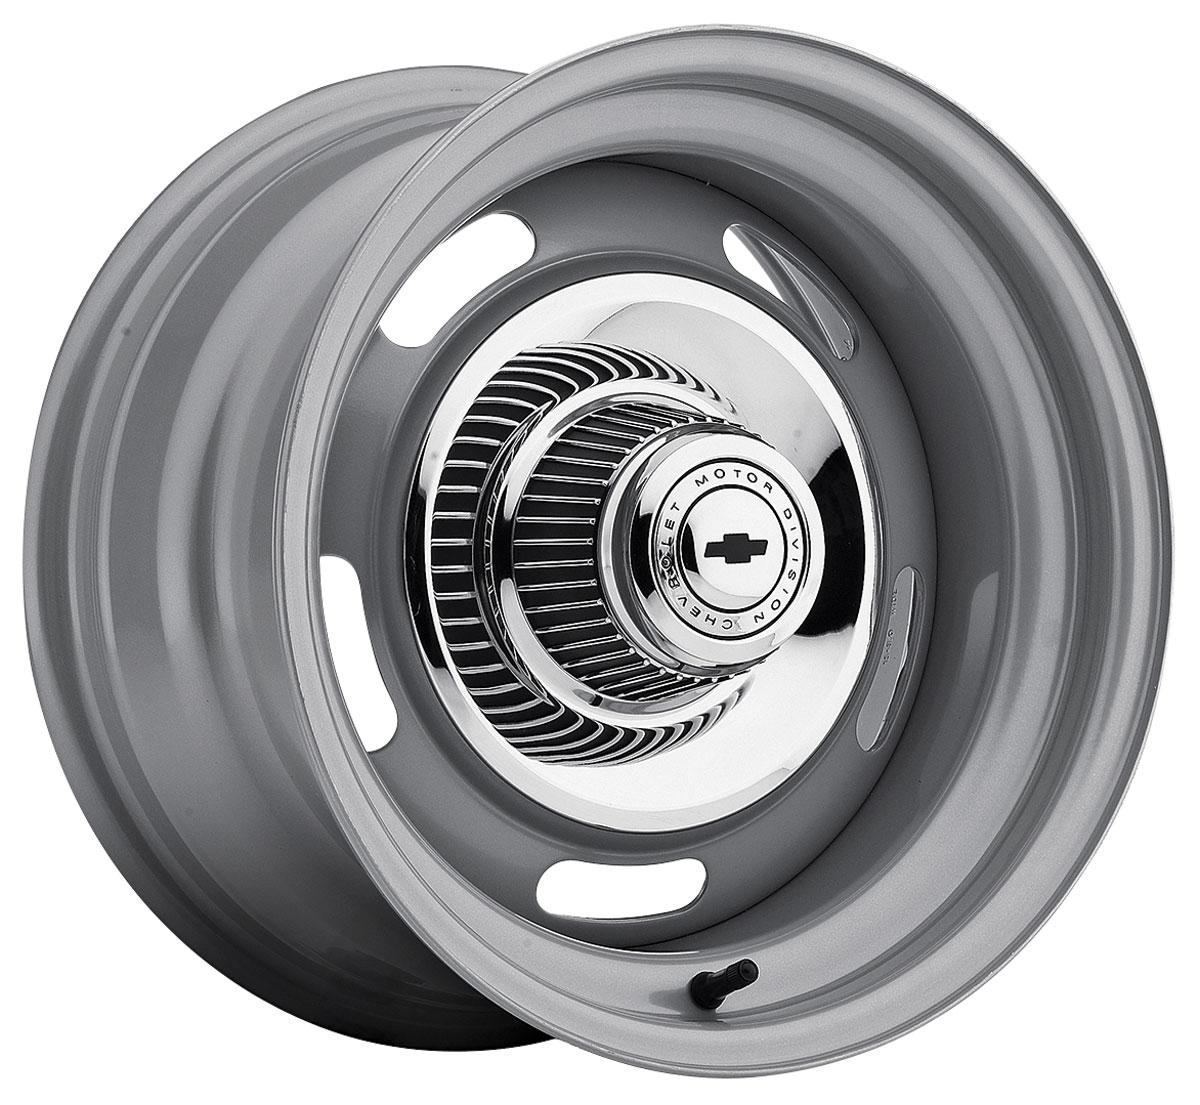 "Rally Wheel, Silver, 15"" X 10"", 4-1/4"" Backspacing"